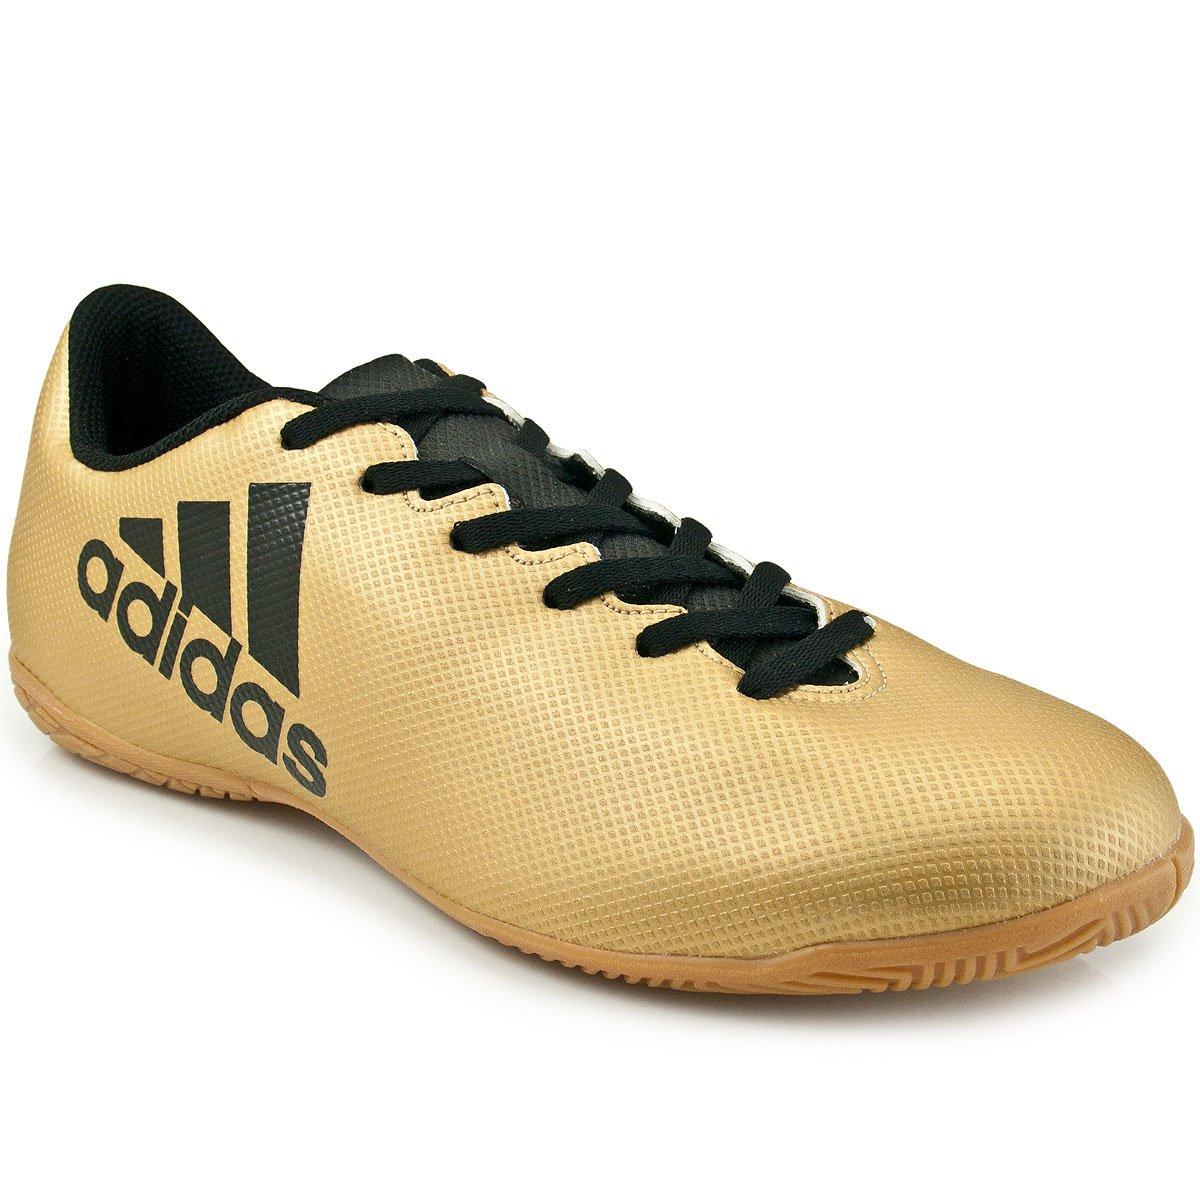 44ab2a3dcc Chuteira Adidas X 17.4 IN